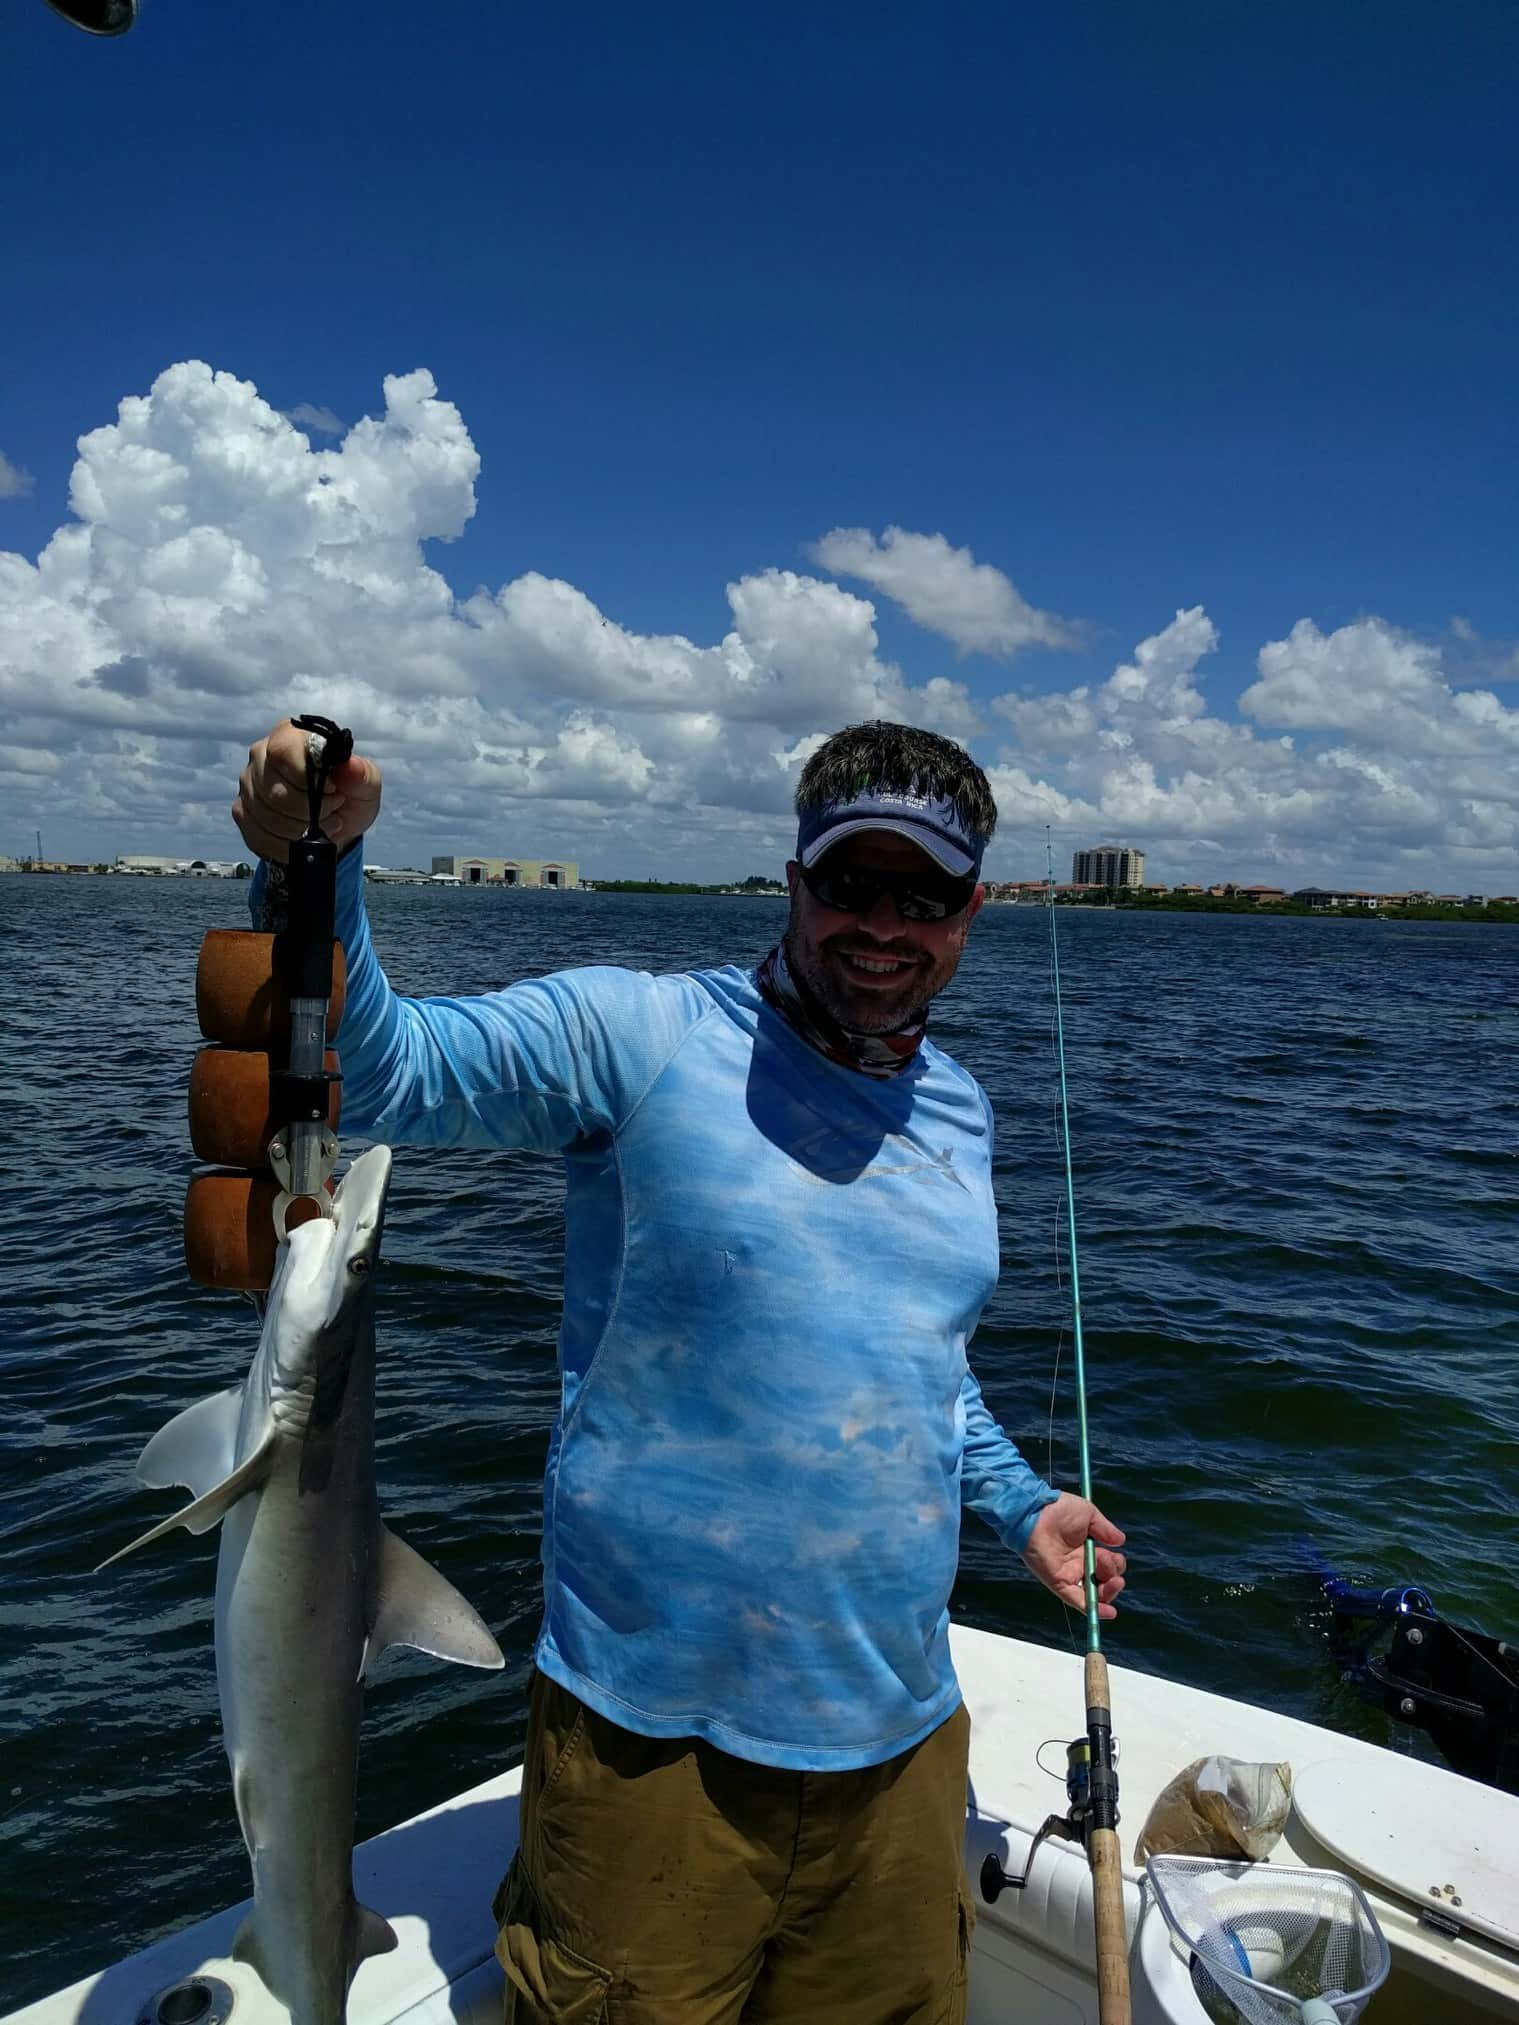 Tampa bay florida fishing charters 813 758 3406 for Florida fishing guides